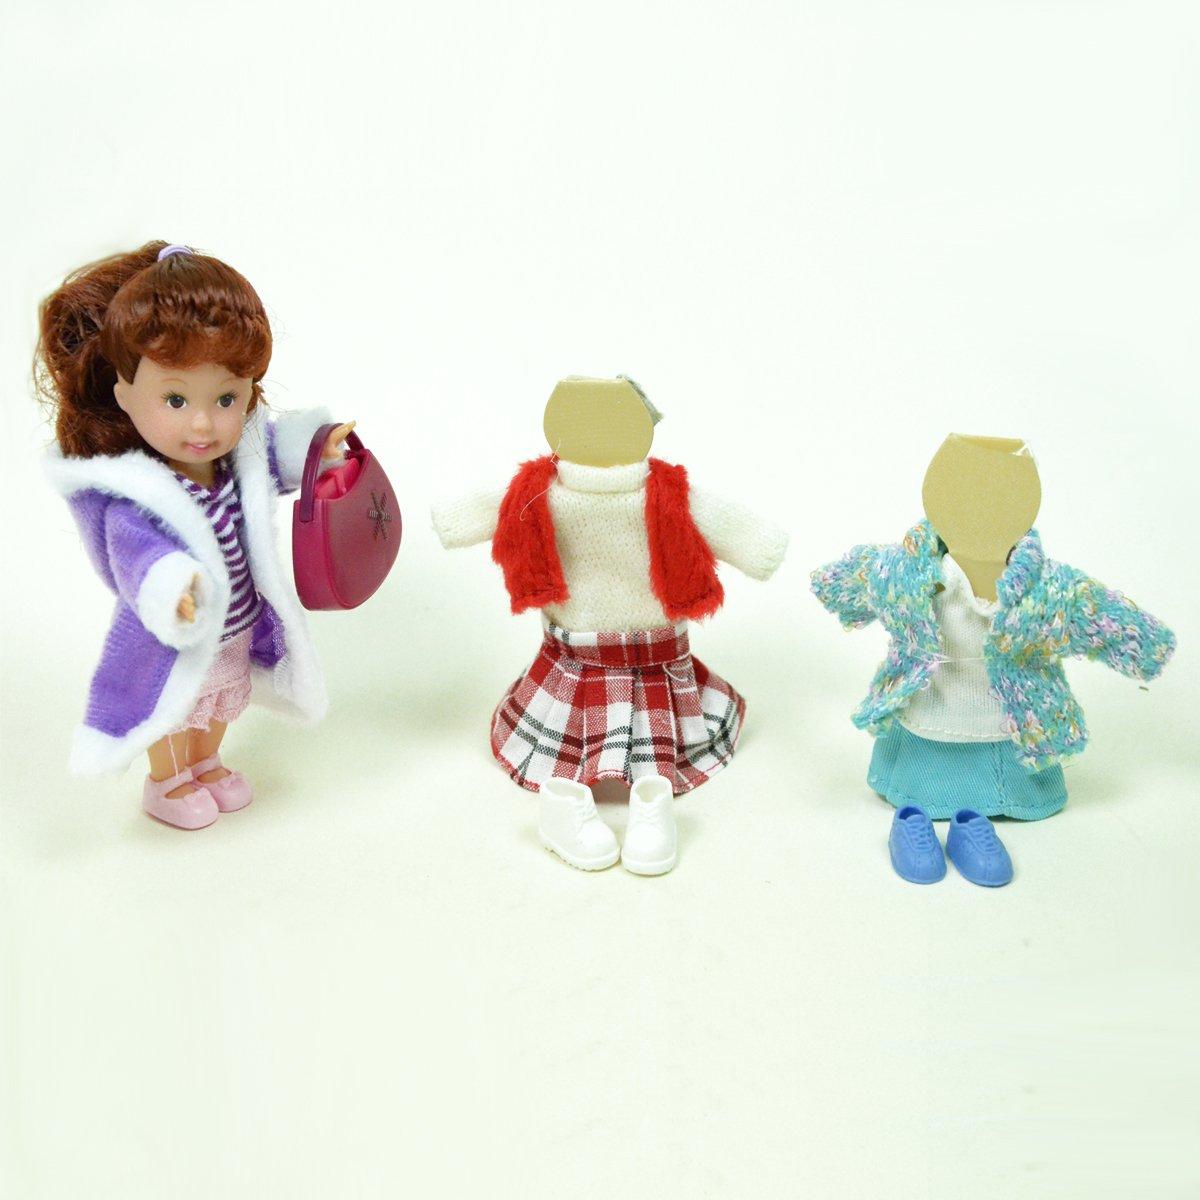 Li'l Dolly Winter collection #1